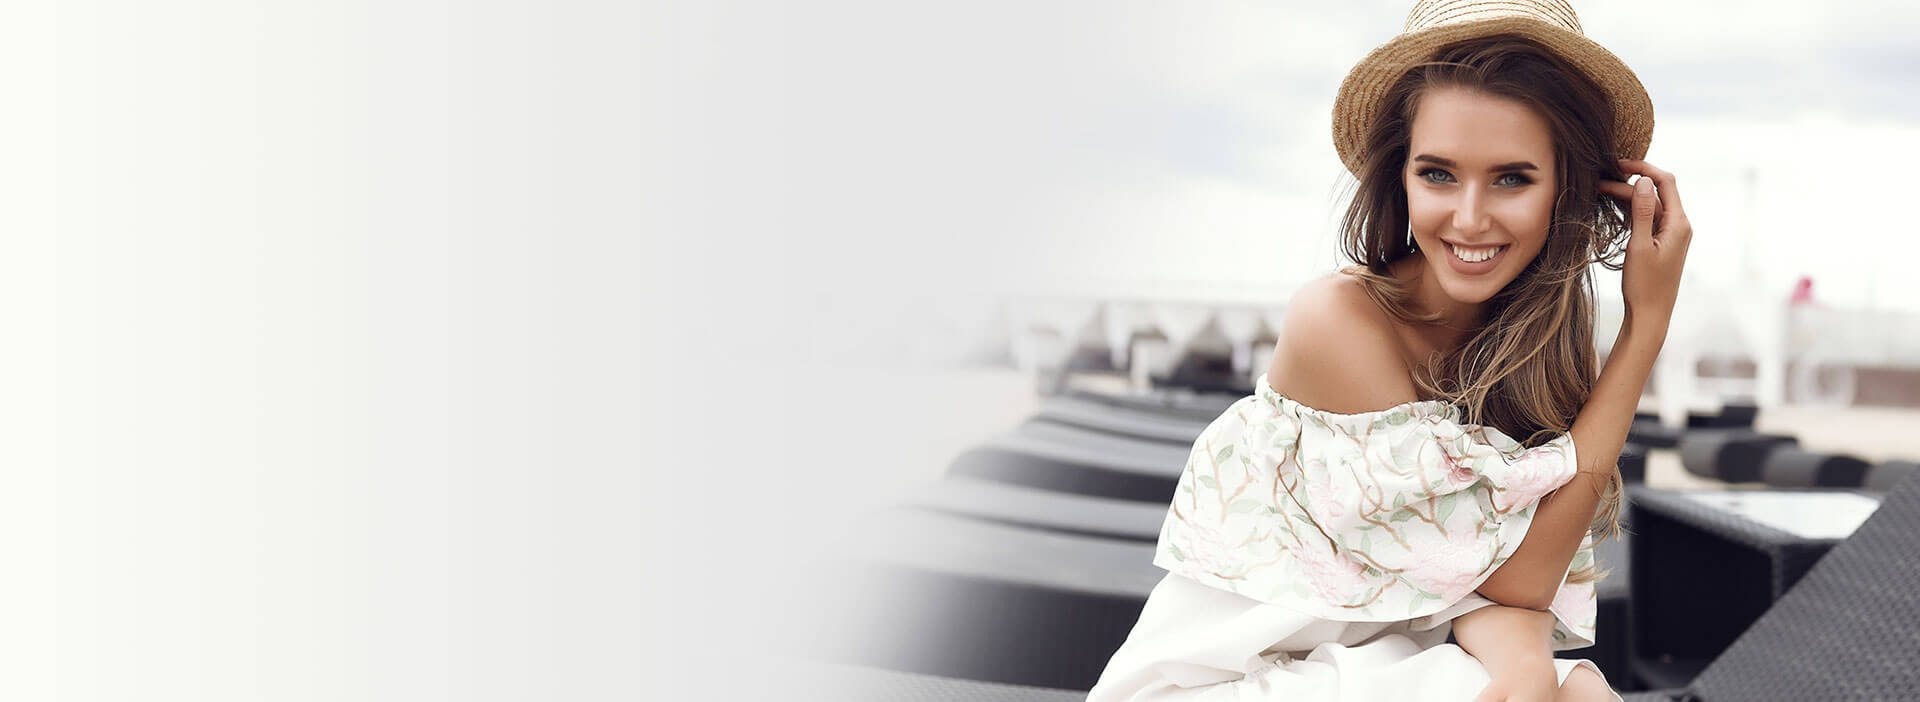 Laser YAG ® - Clinique Medico-esthétique